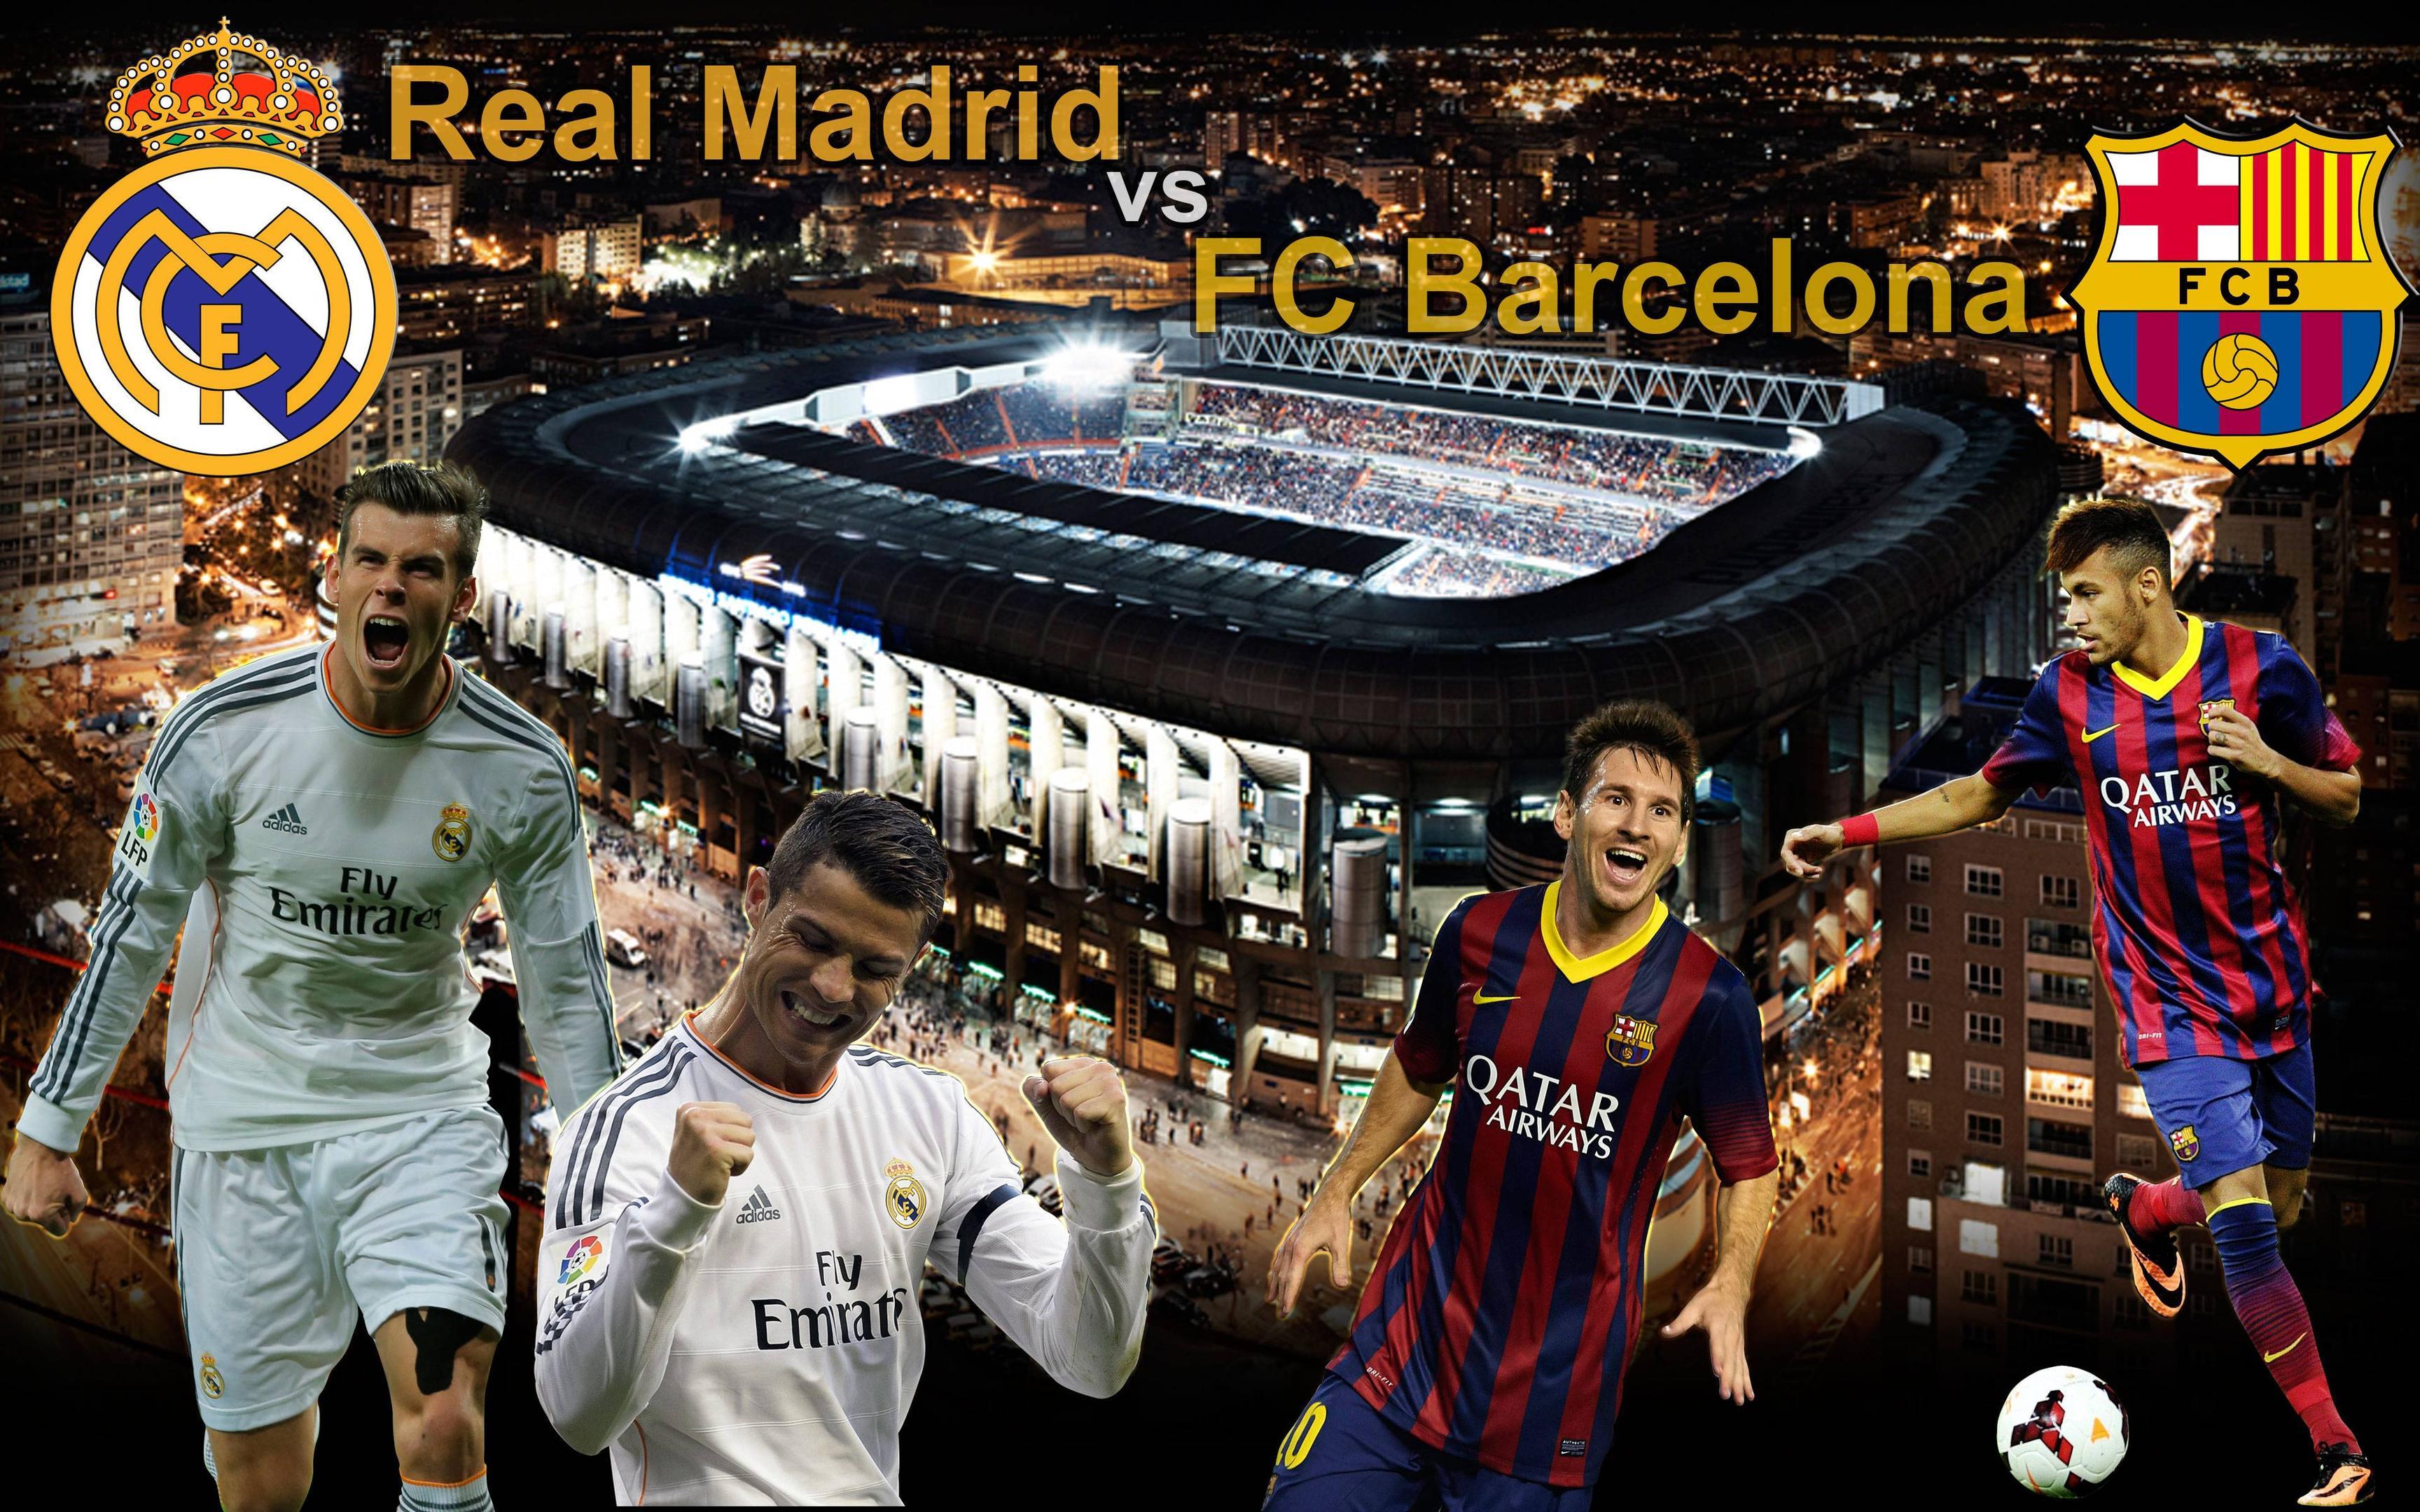 Ronaldo Vs Messi Wallpapers 2015 3456x2160